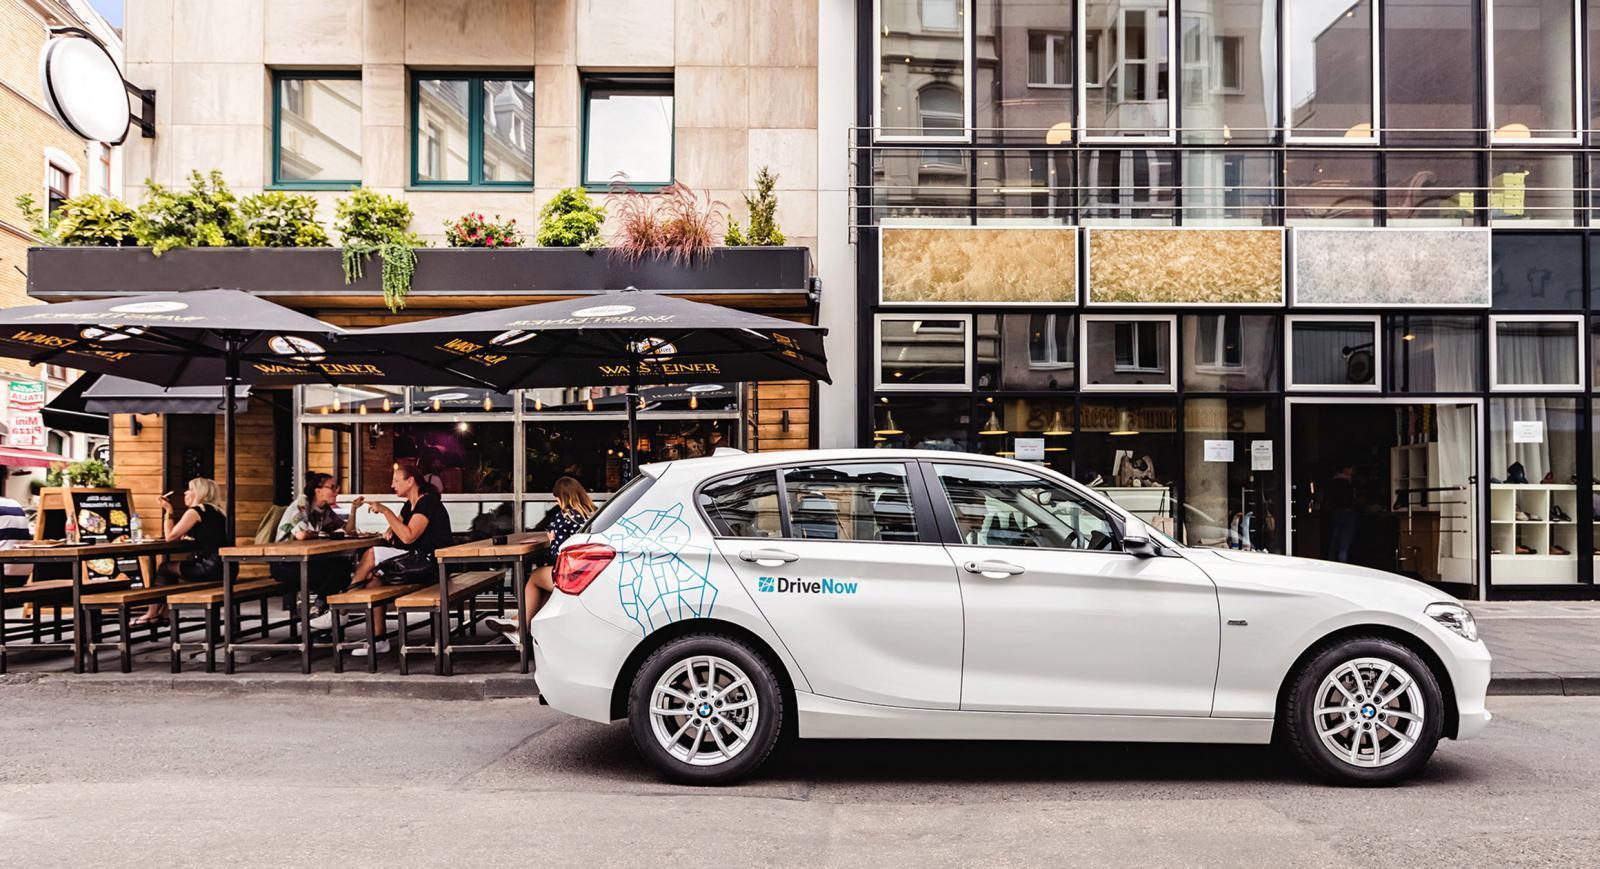 DriveNow_Carsharing_Köln_BMW_Parken_Elektroautos_Kurzstrecke_Car2Go_Langstrecke_Finanztip